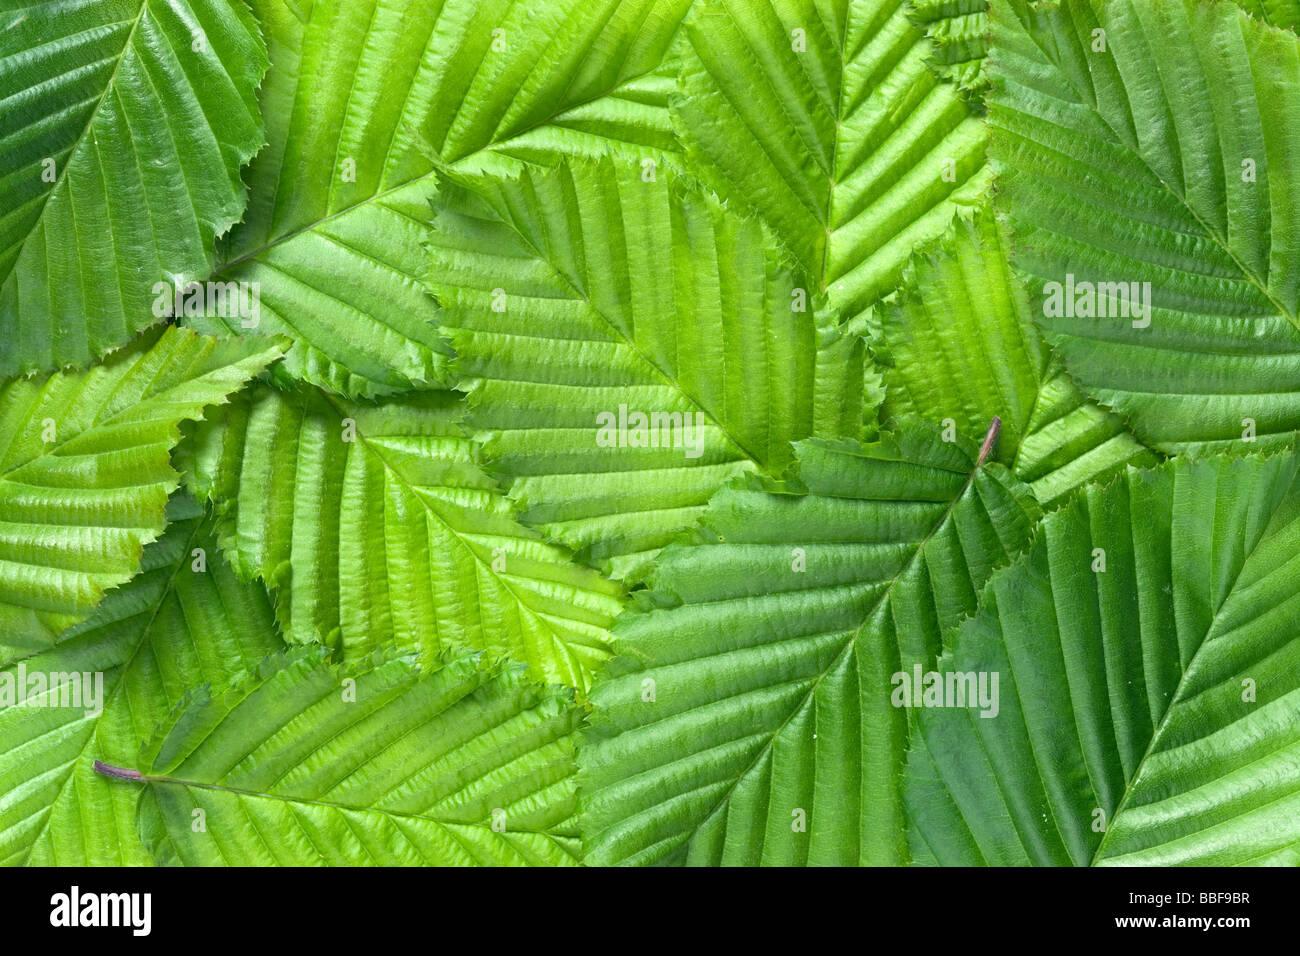 Blatt-Muster. Blätter der Hainbuche, Carpinus Betulus. Stockbild